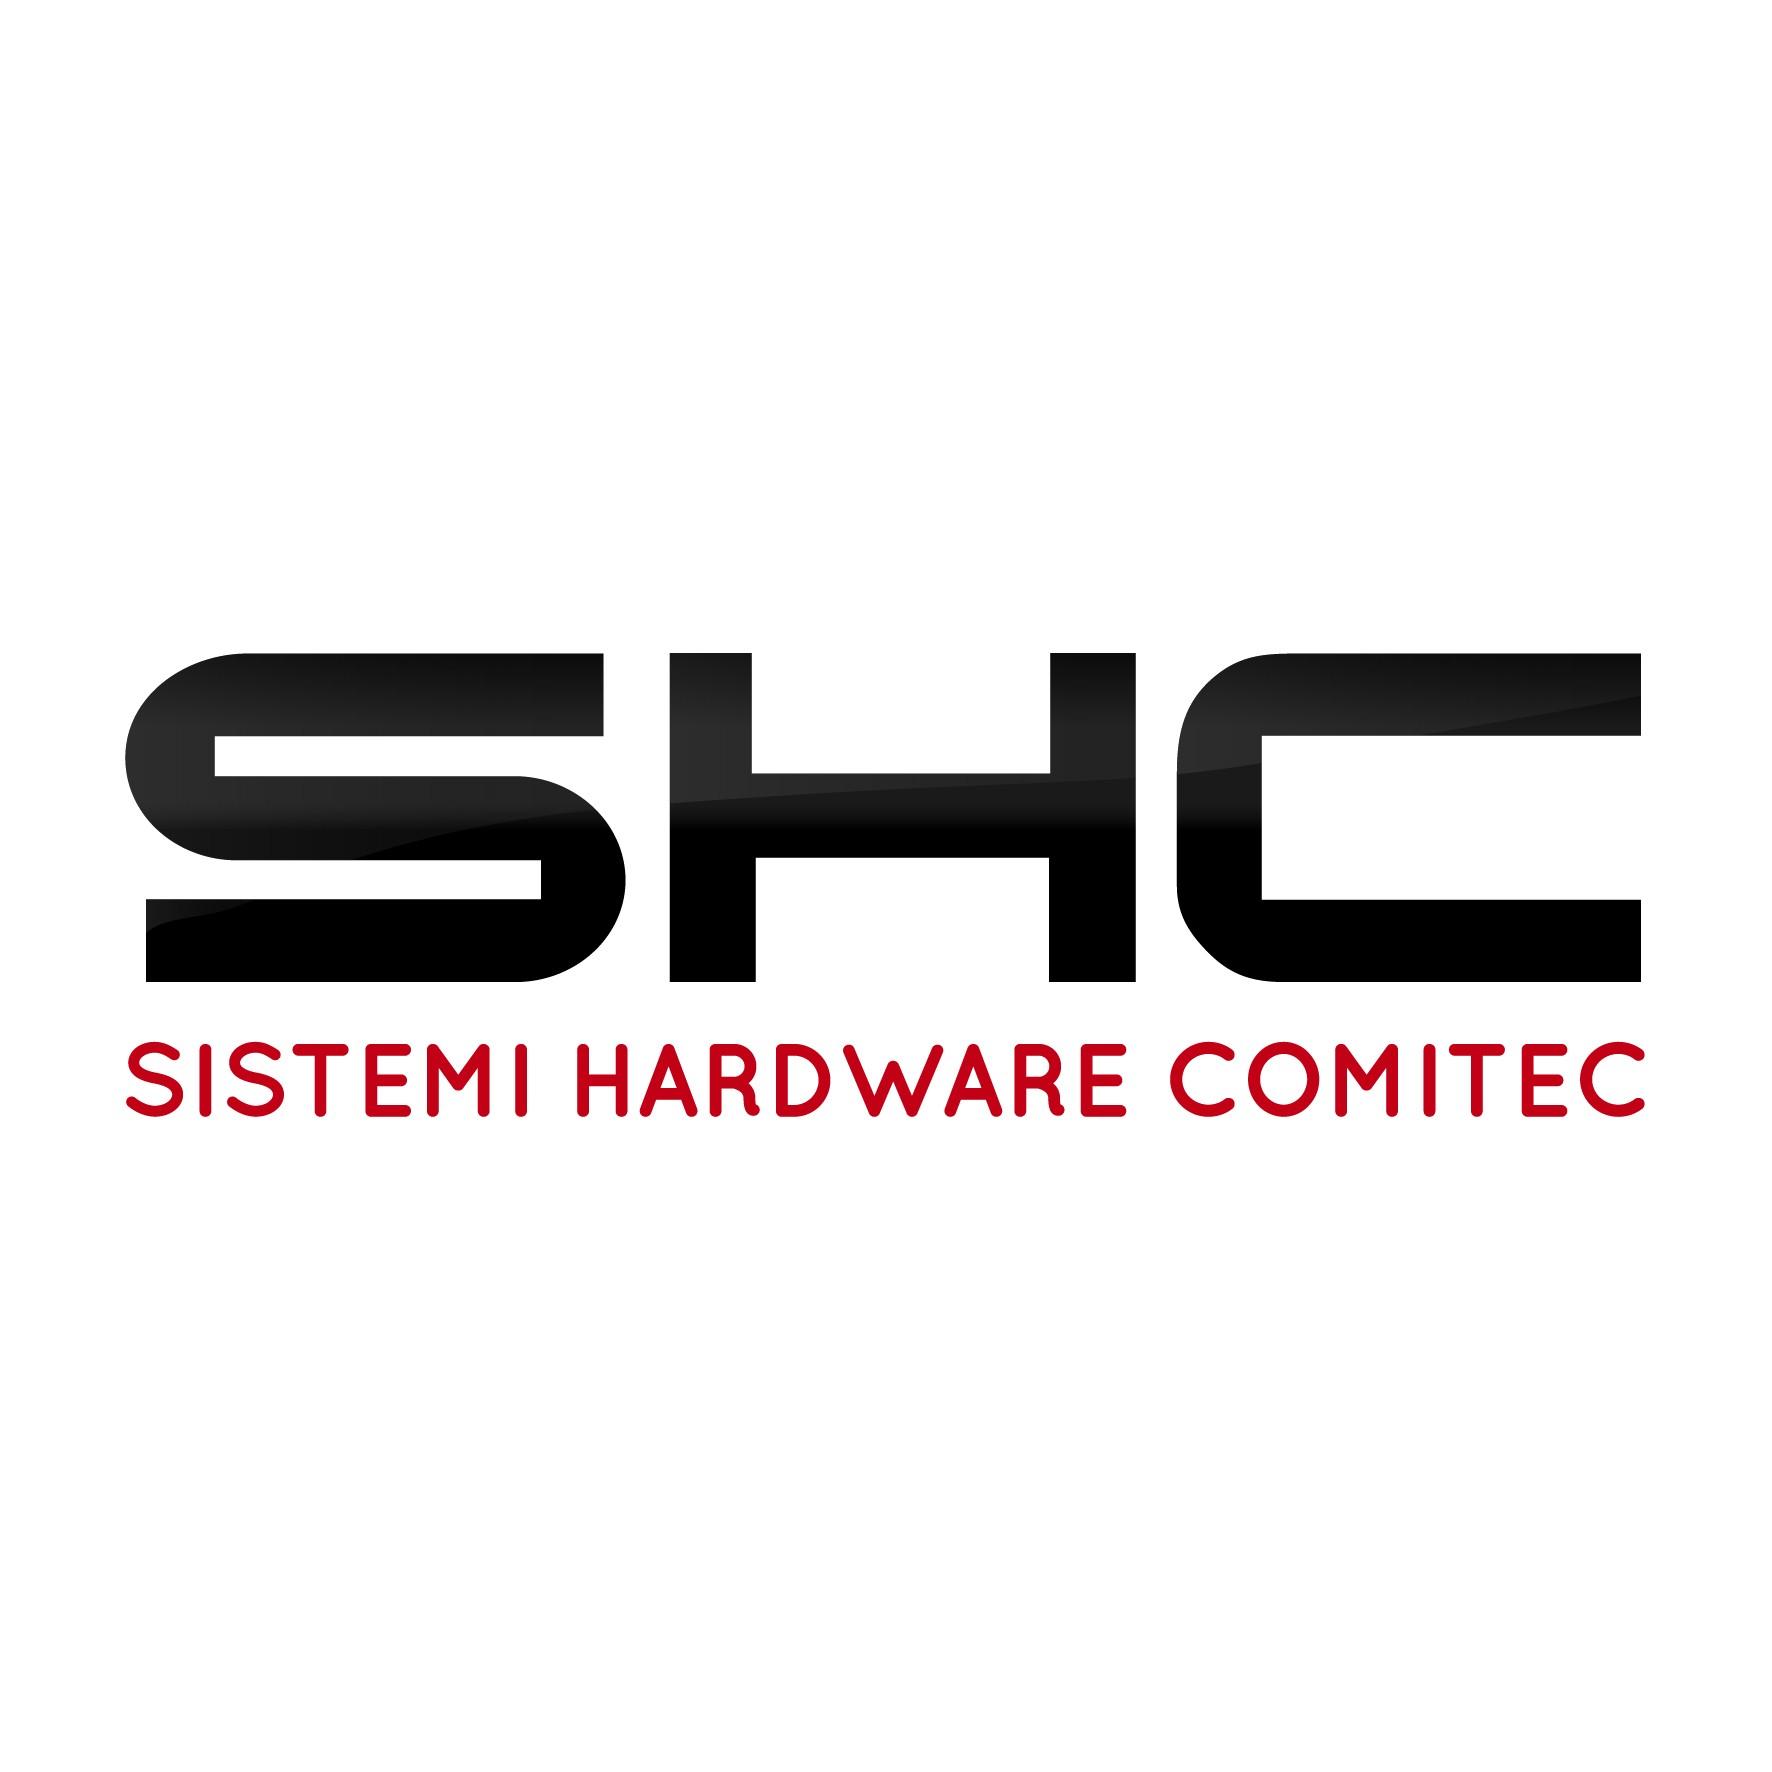 SHC COMITEC